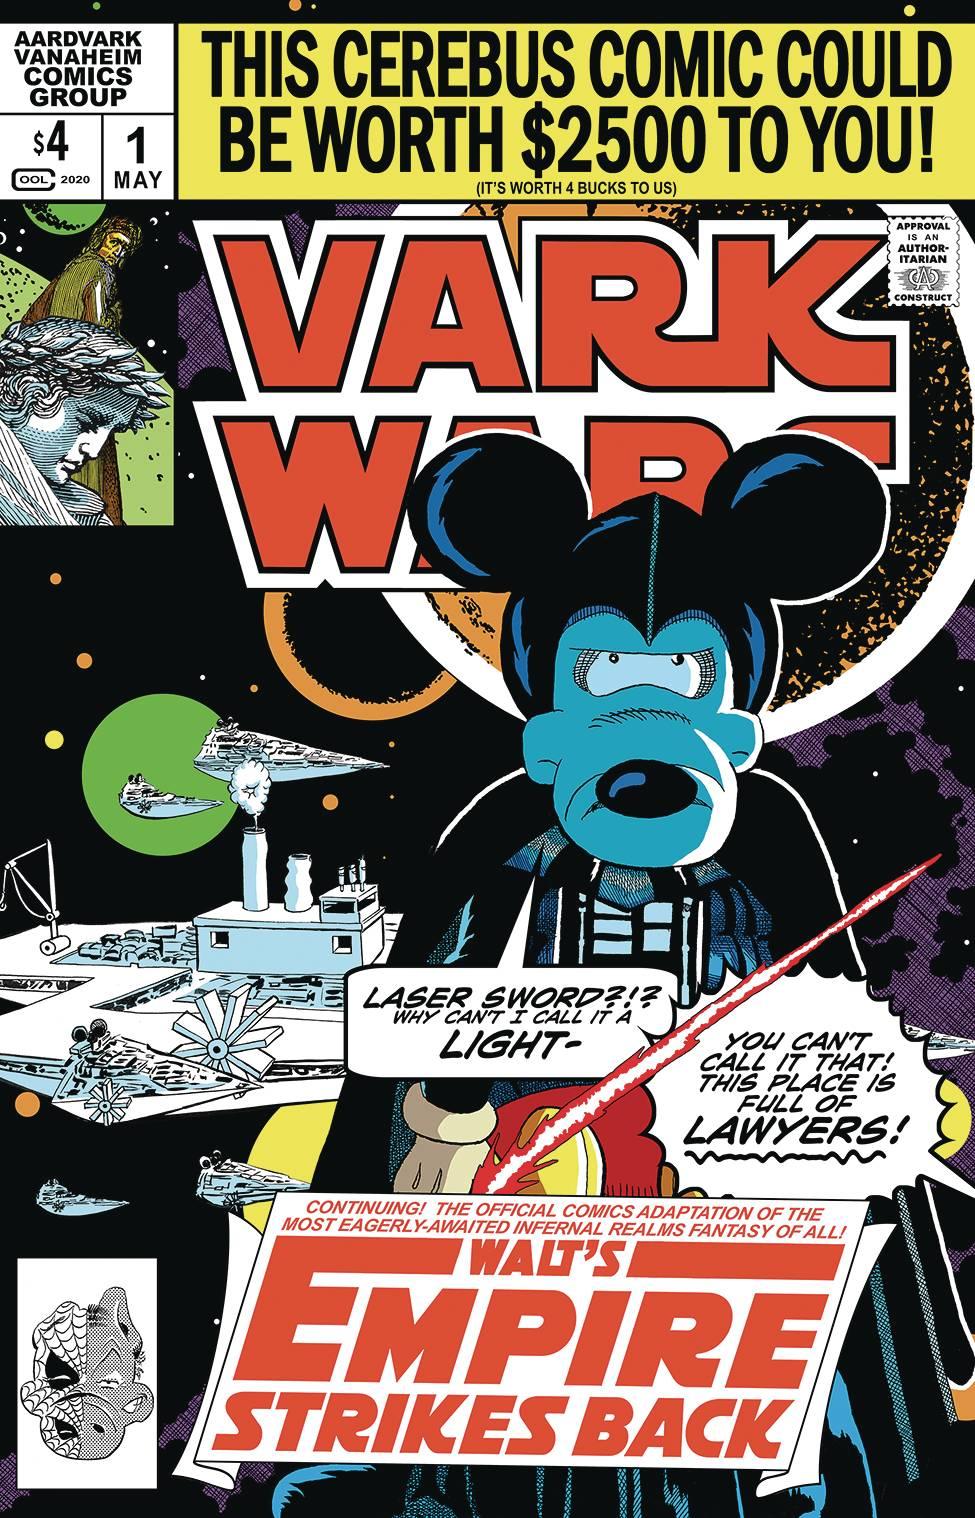 Vark Wars: Walt`s Empire Strikes Back (One Shot) #1 (2020)